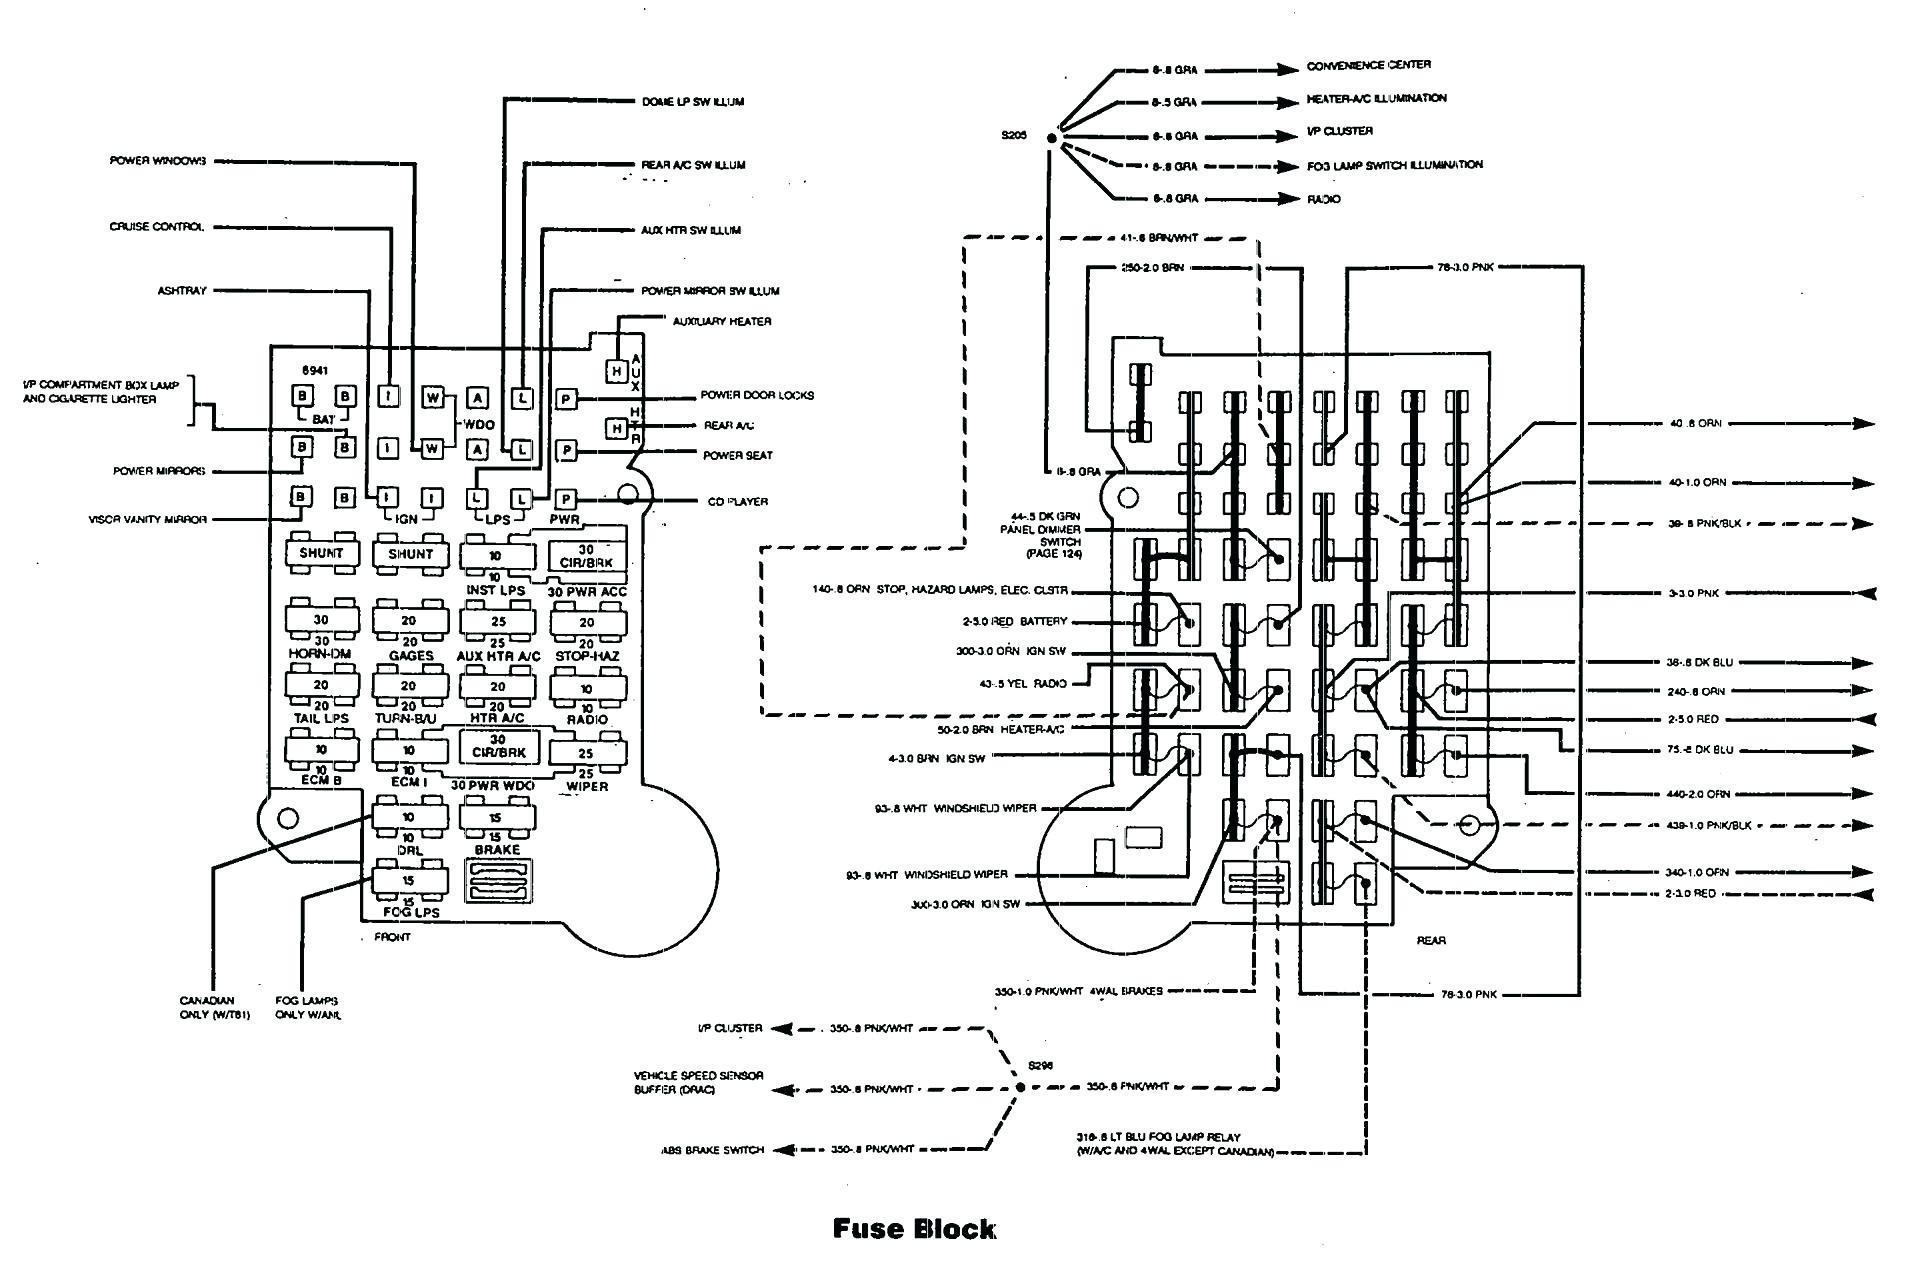 hight resolution of 2002 mitsubishi galant engine diagram wiring diagram mitsubishi mitsubishi lancer repair 2002 mitsubishi galant engine diagram